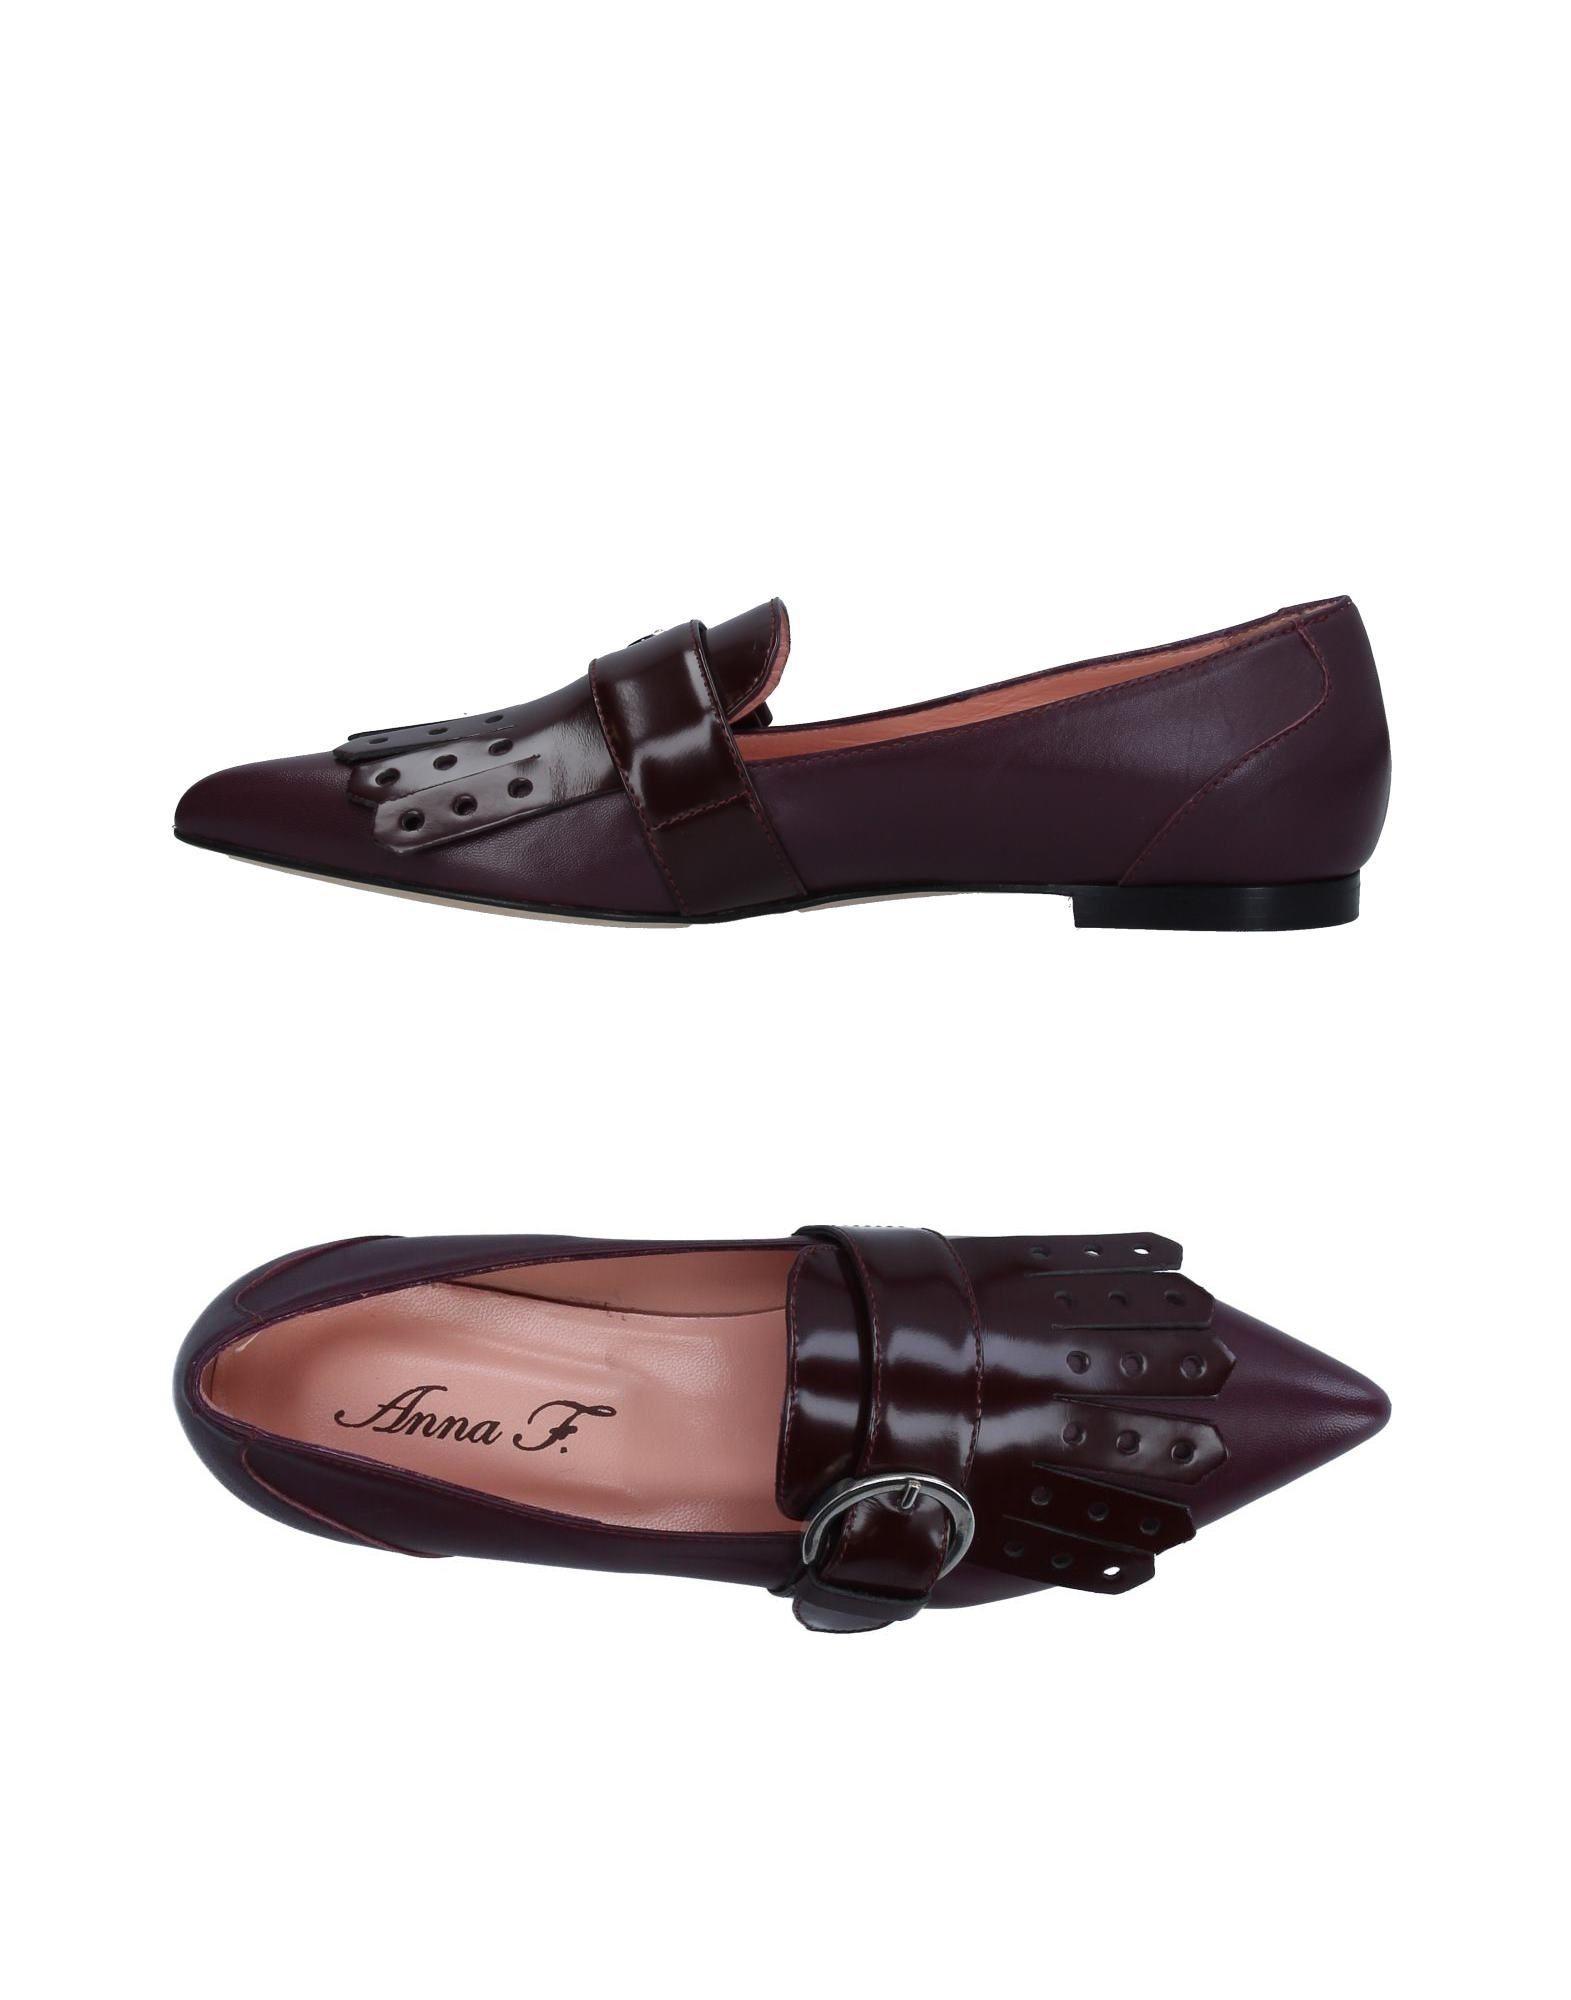 Anna F. Mokassins Damen  11337988OV Gute Qualität beliebte Schuhe